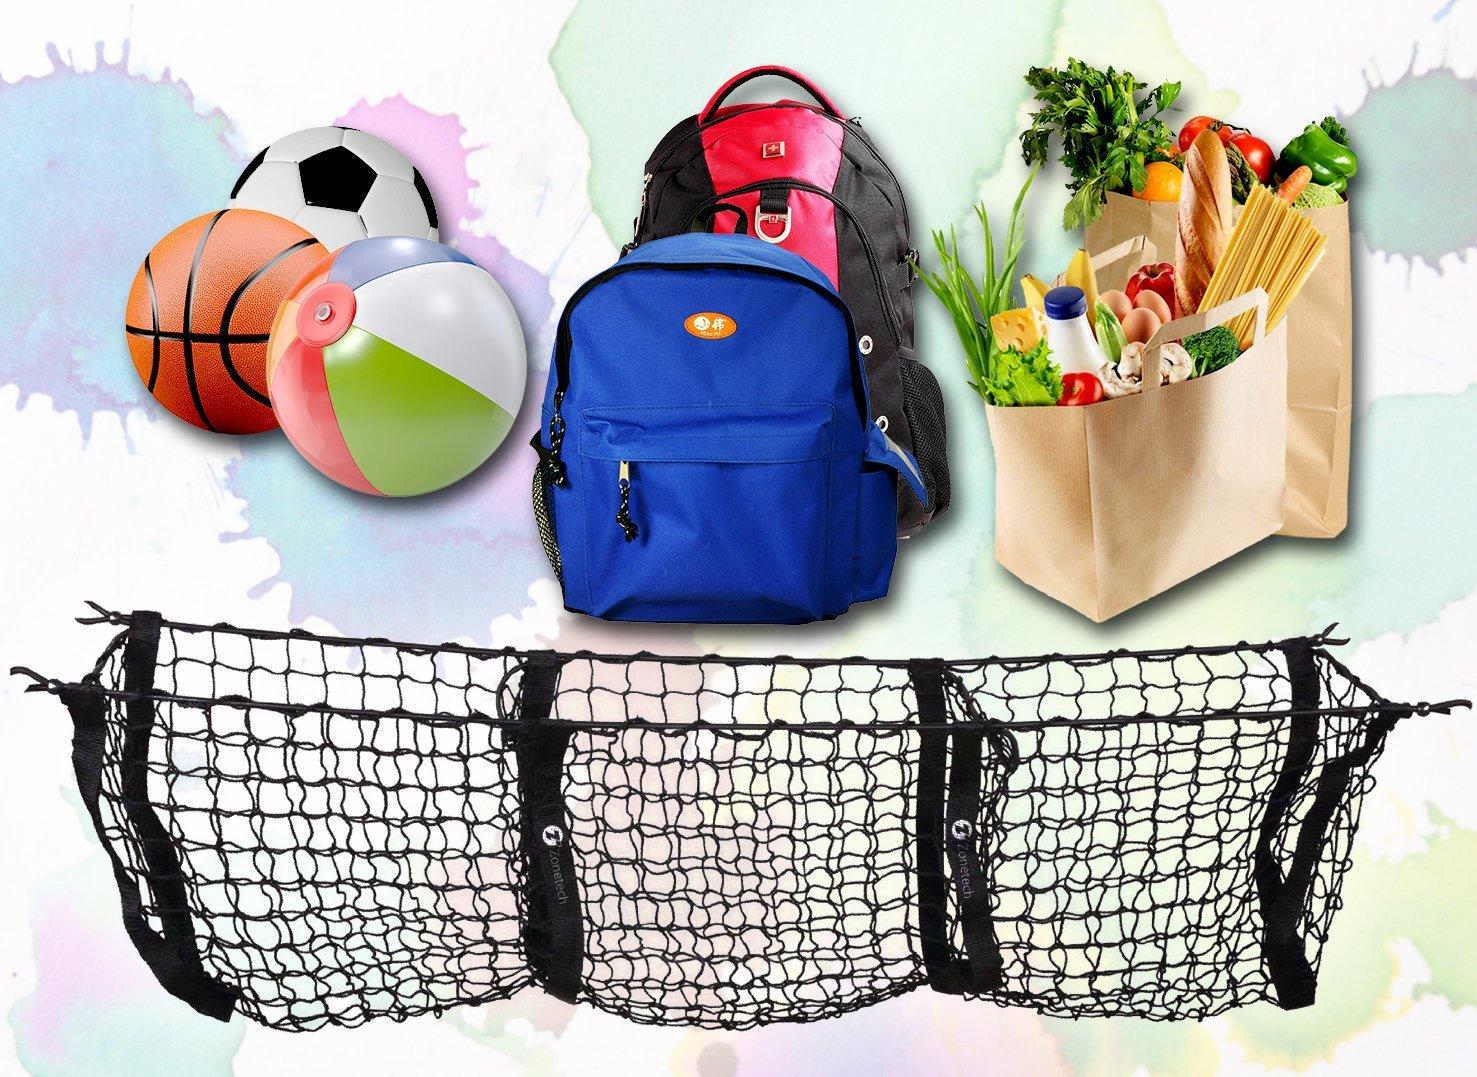 Bicycle Basket Handlebar Bag Black Zone Tech Premium Quality Handlebar Bag with Reflective Stripe for Outdoor Activity